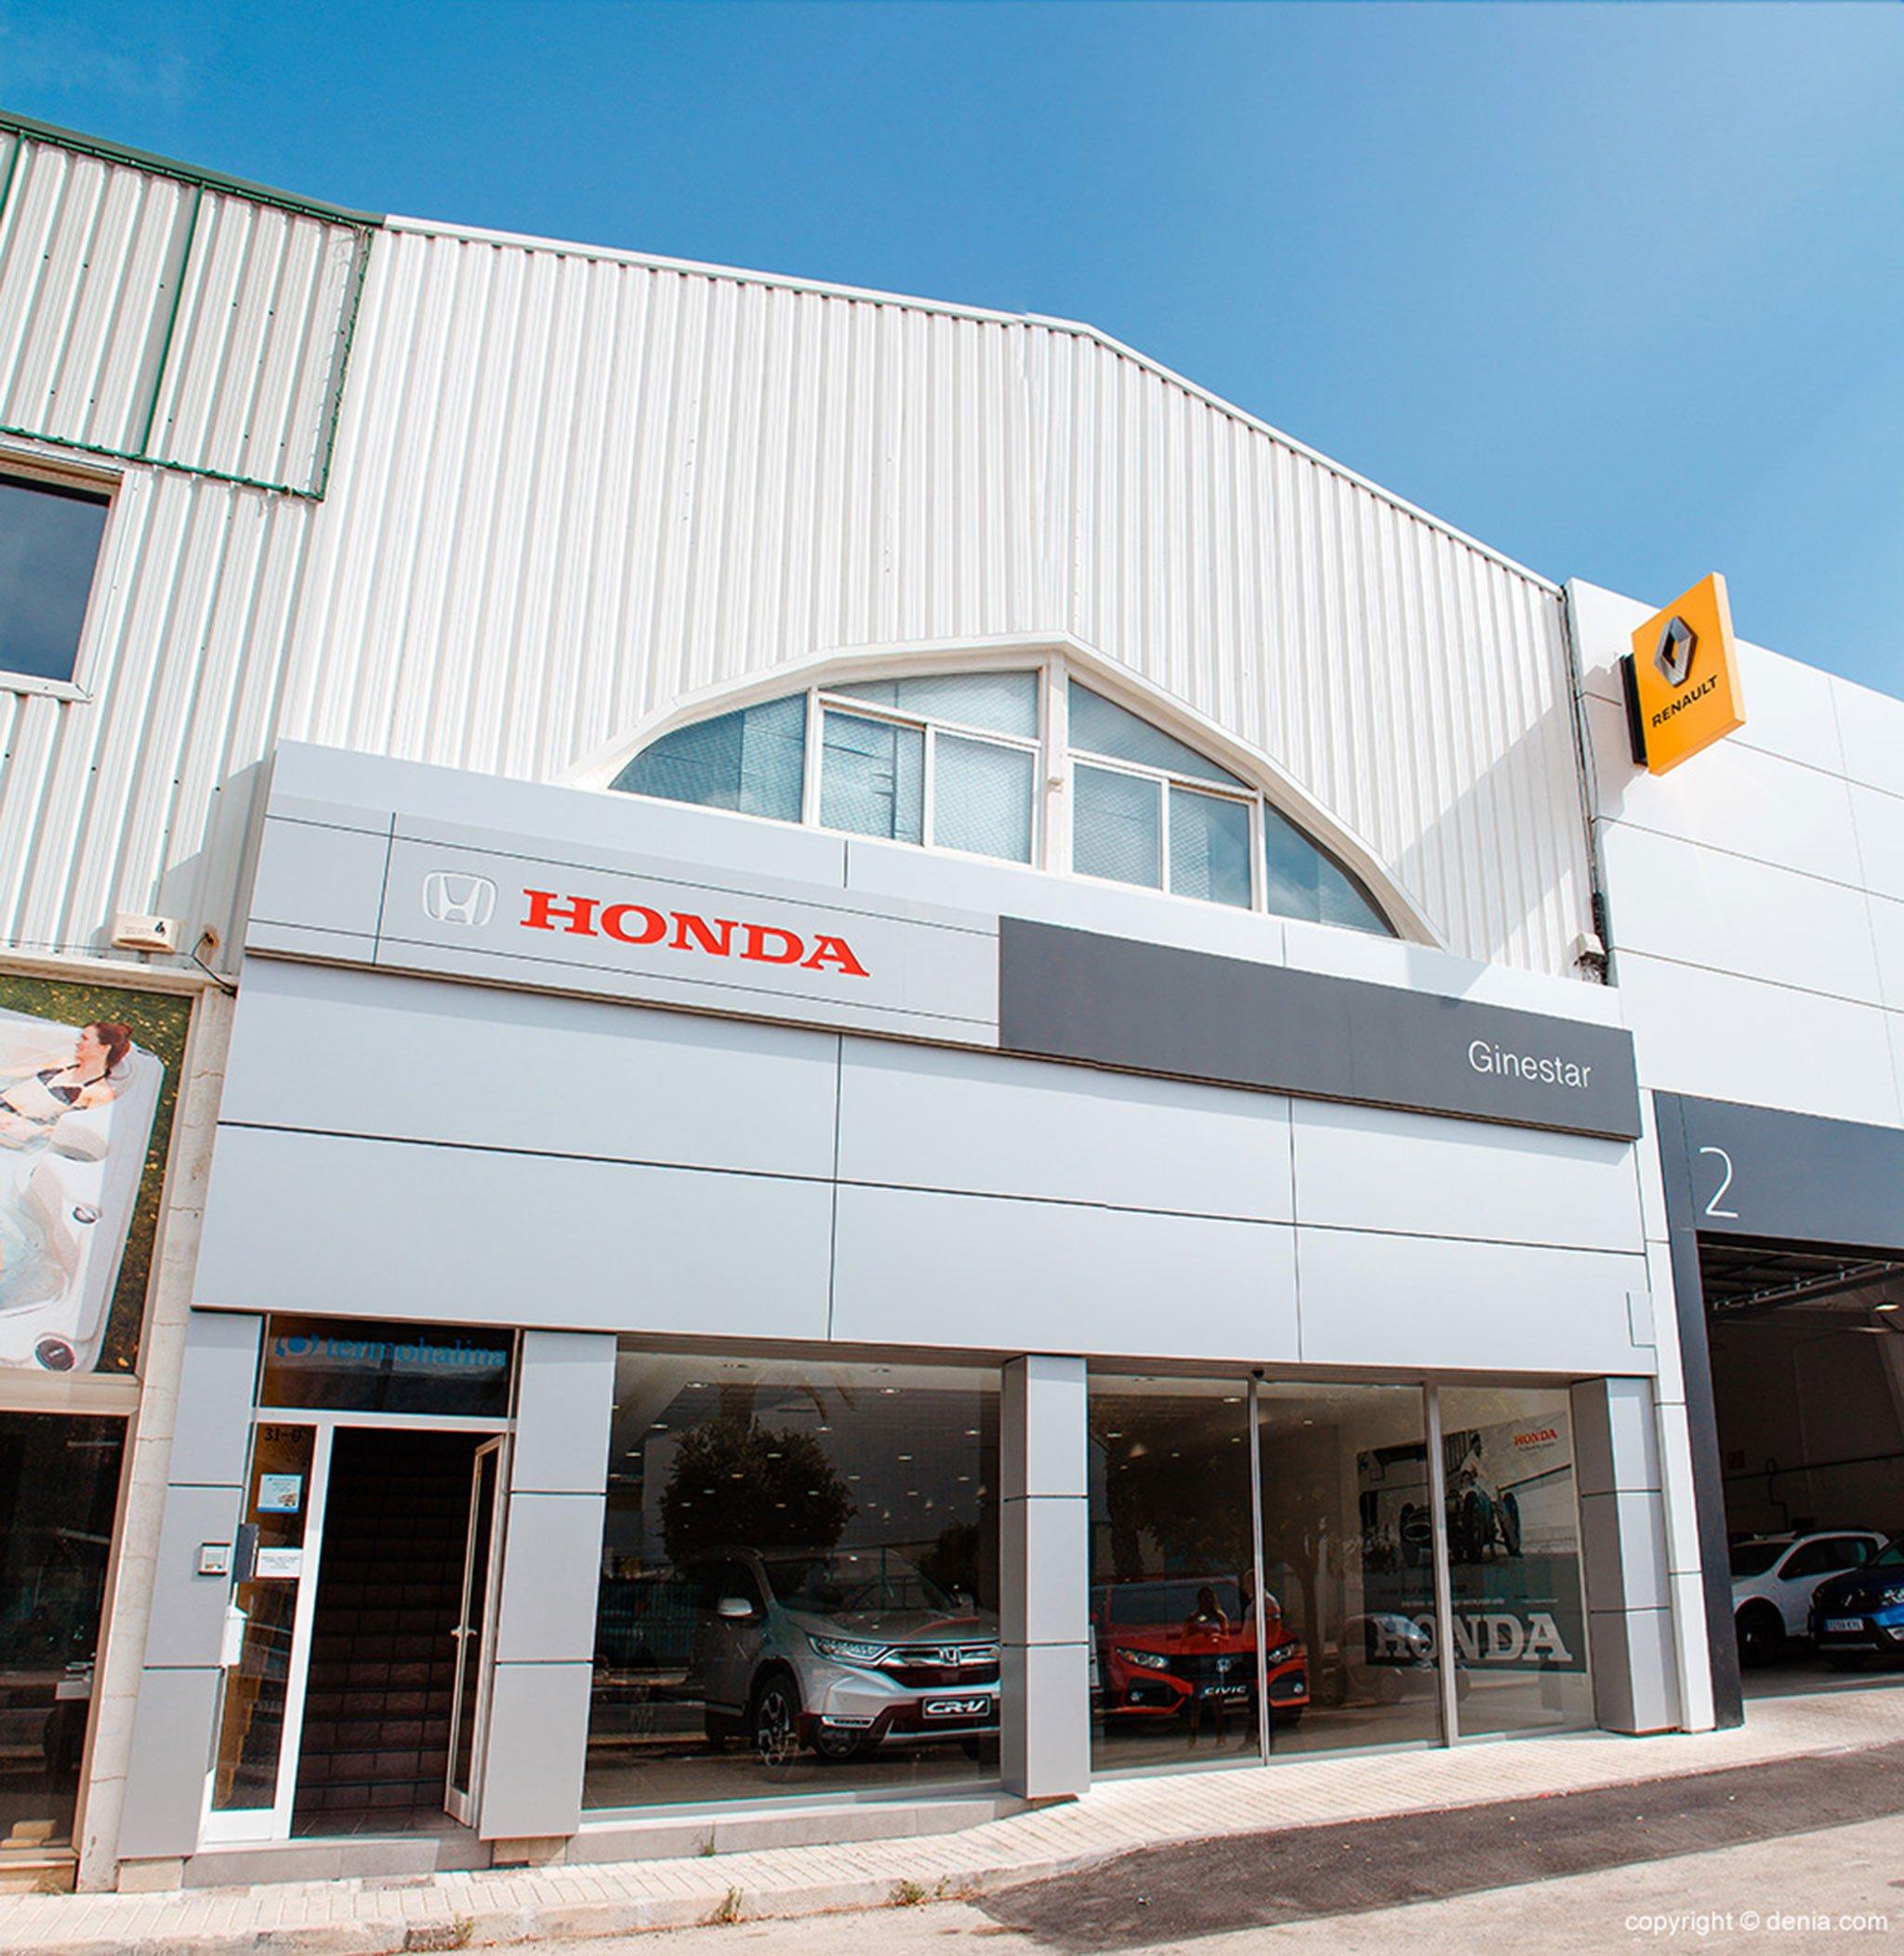 Entry of Honda Ginestar in Dénia